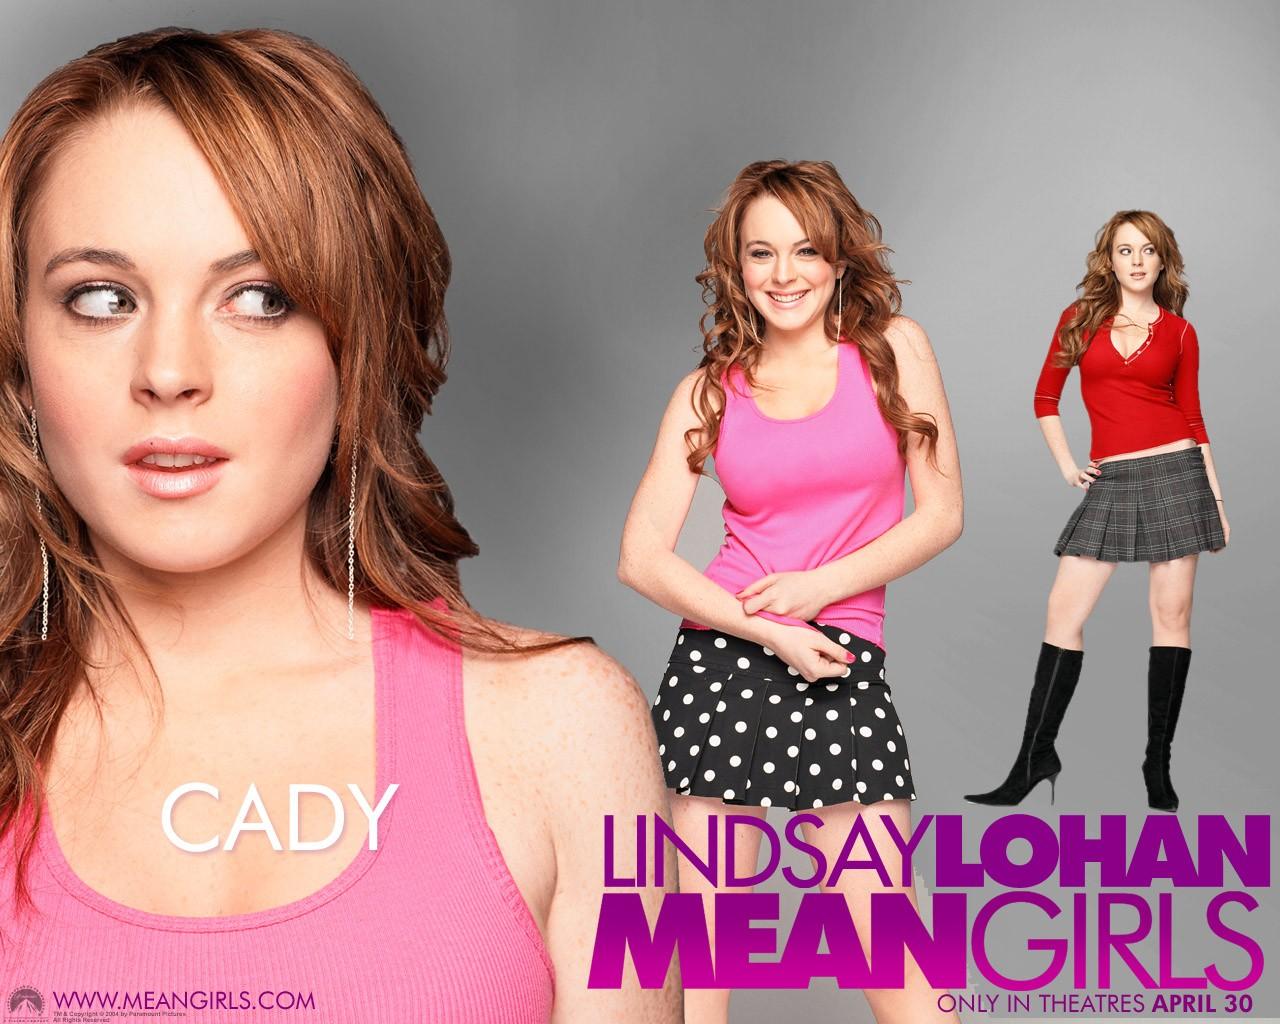 Un wallpaper di Lindsay Lohan (Cady Heron) per il film Mean Girls